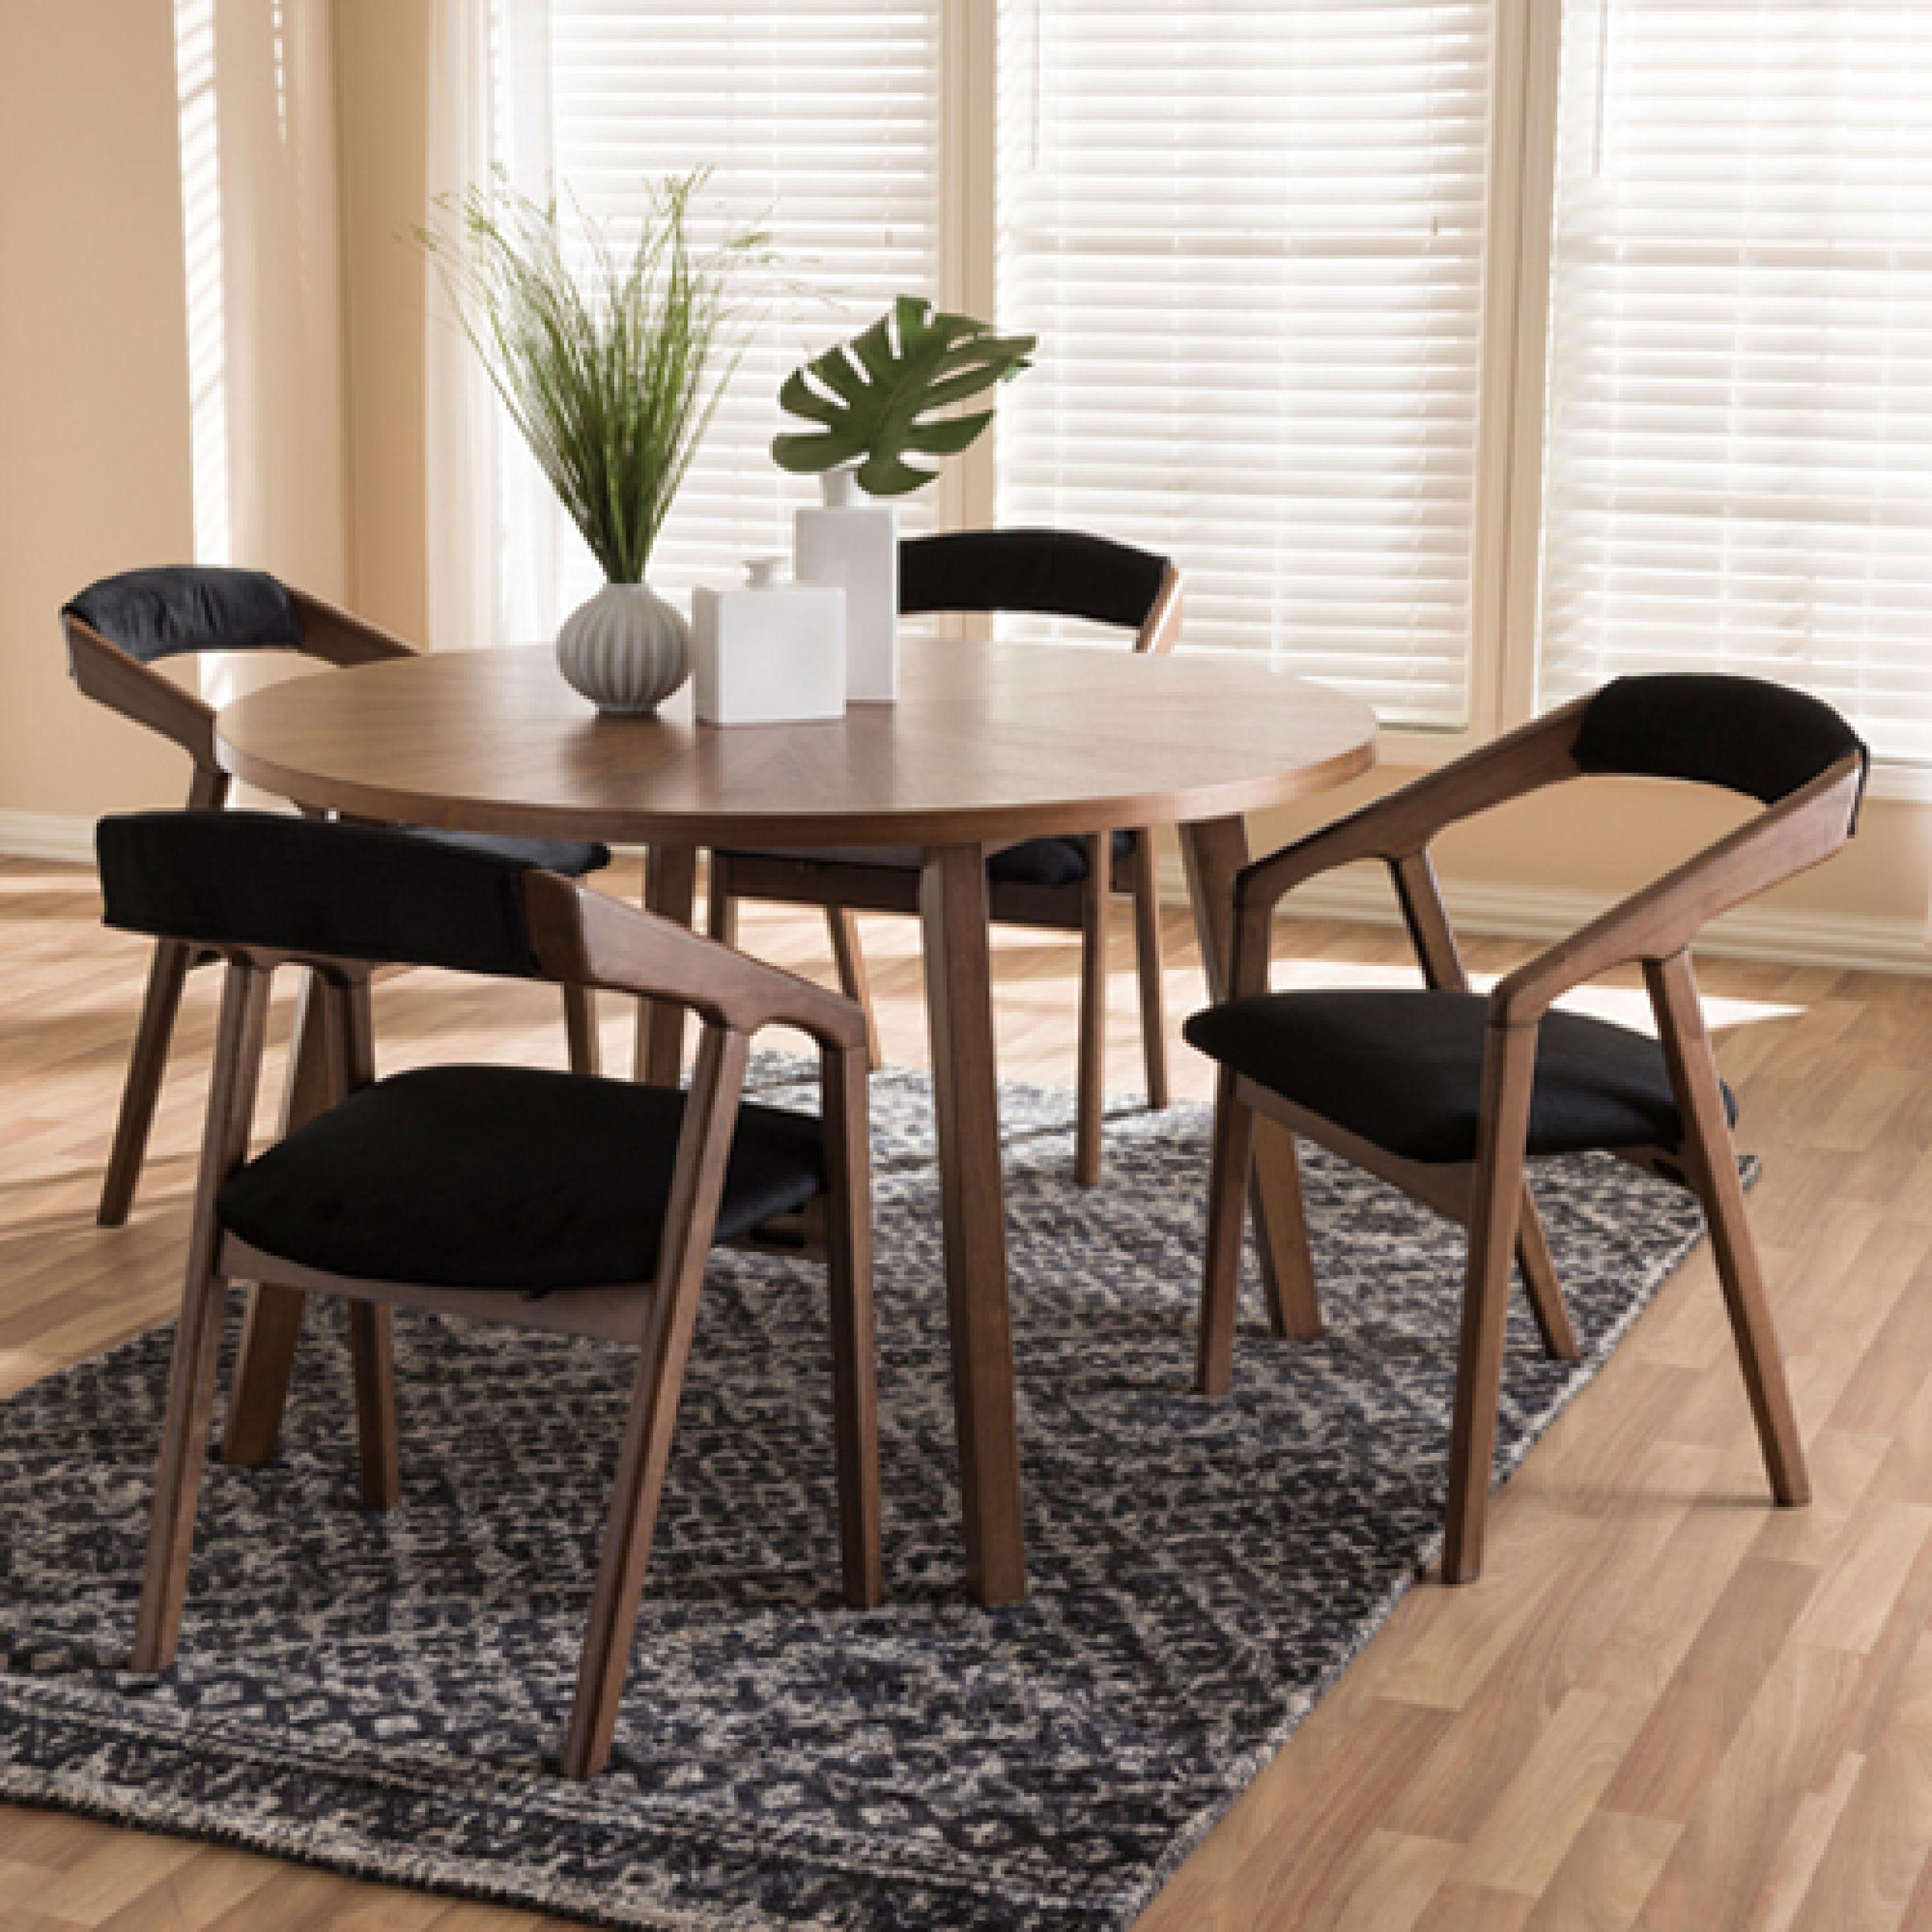 Stupendous Baxton Studio Wendy 5Pc Dining Set Boscovs Boscovs Camellatalisay Diy Chair Ideas Camellatalisaycom